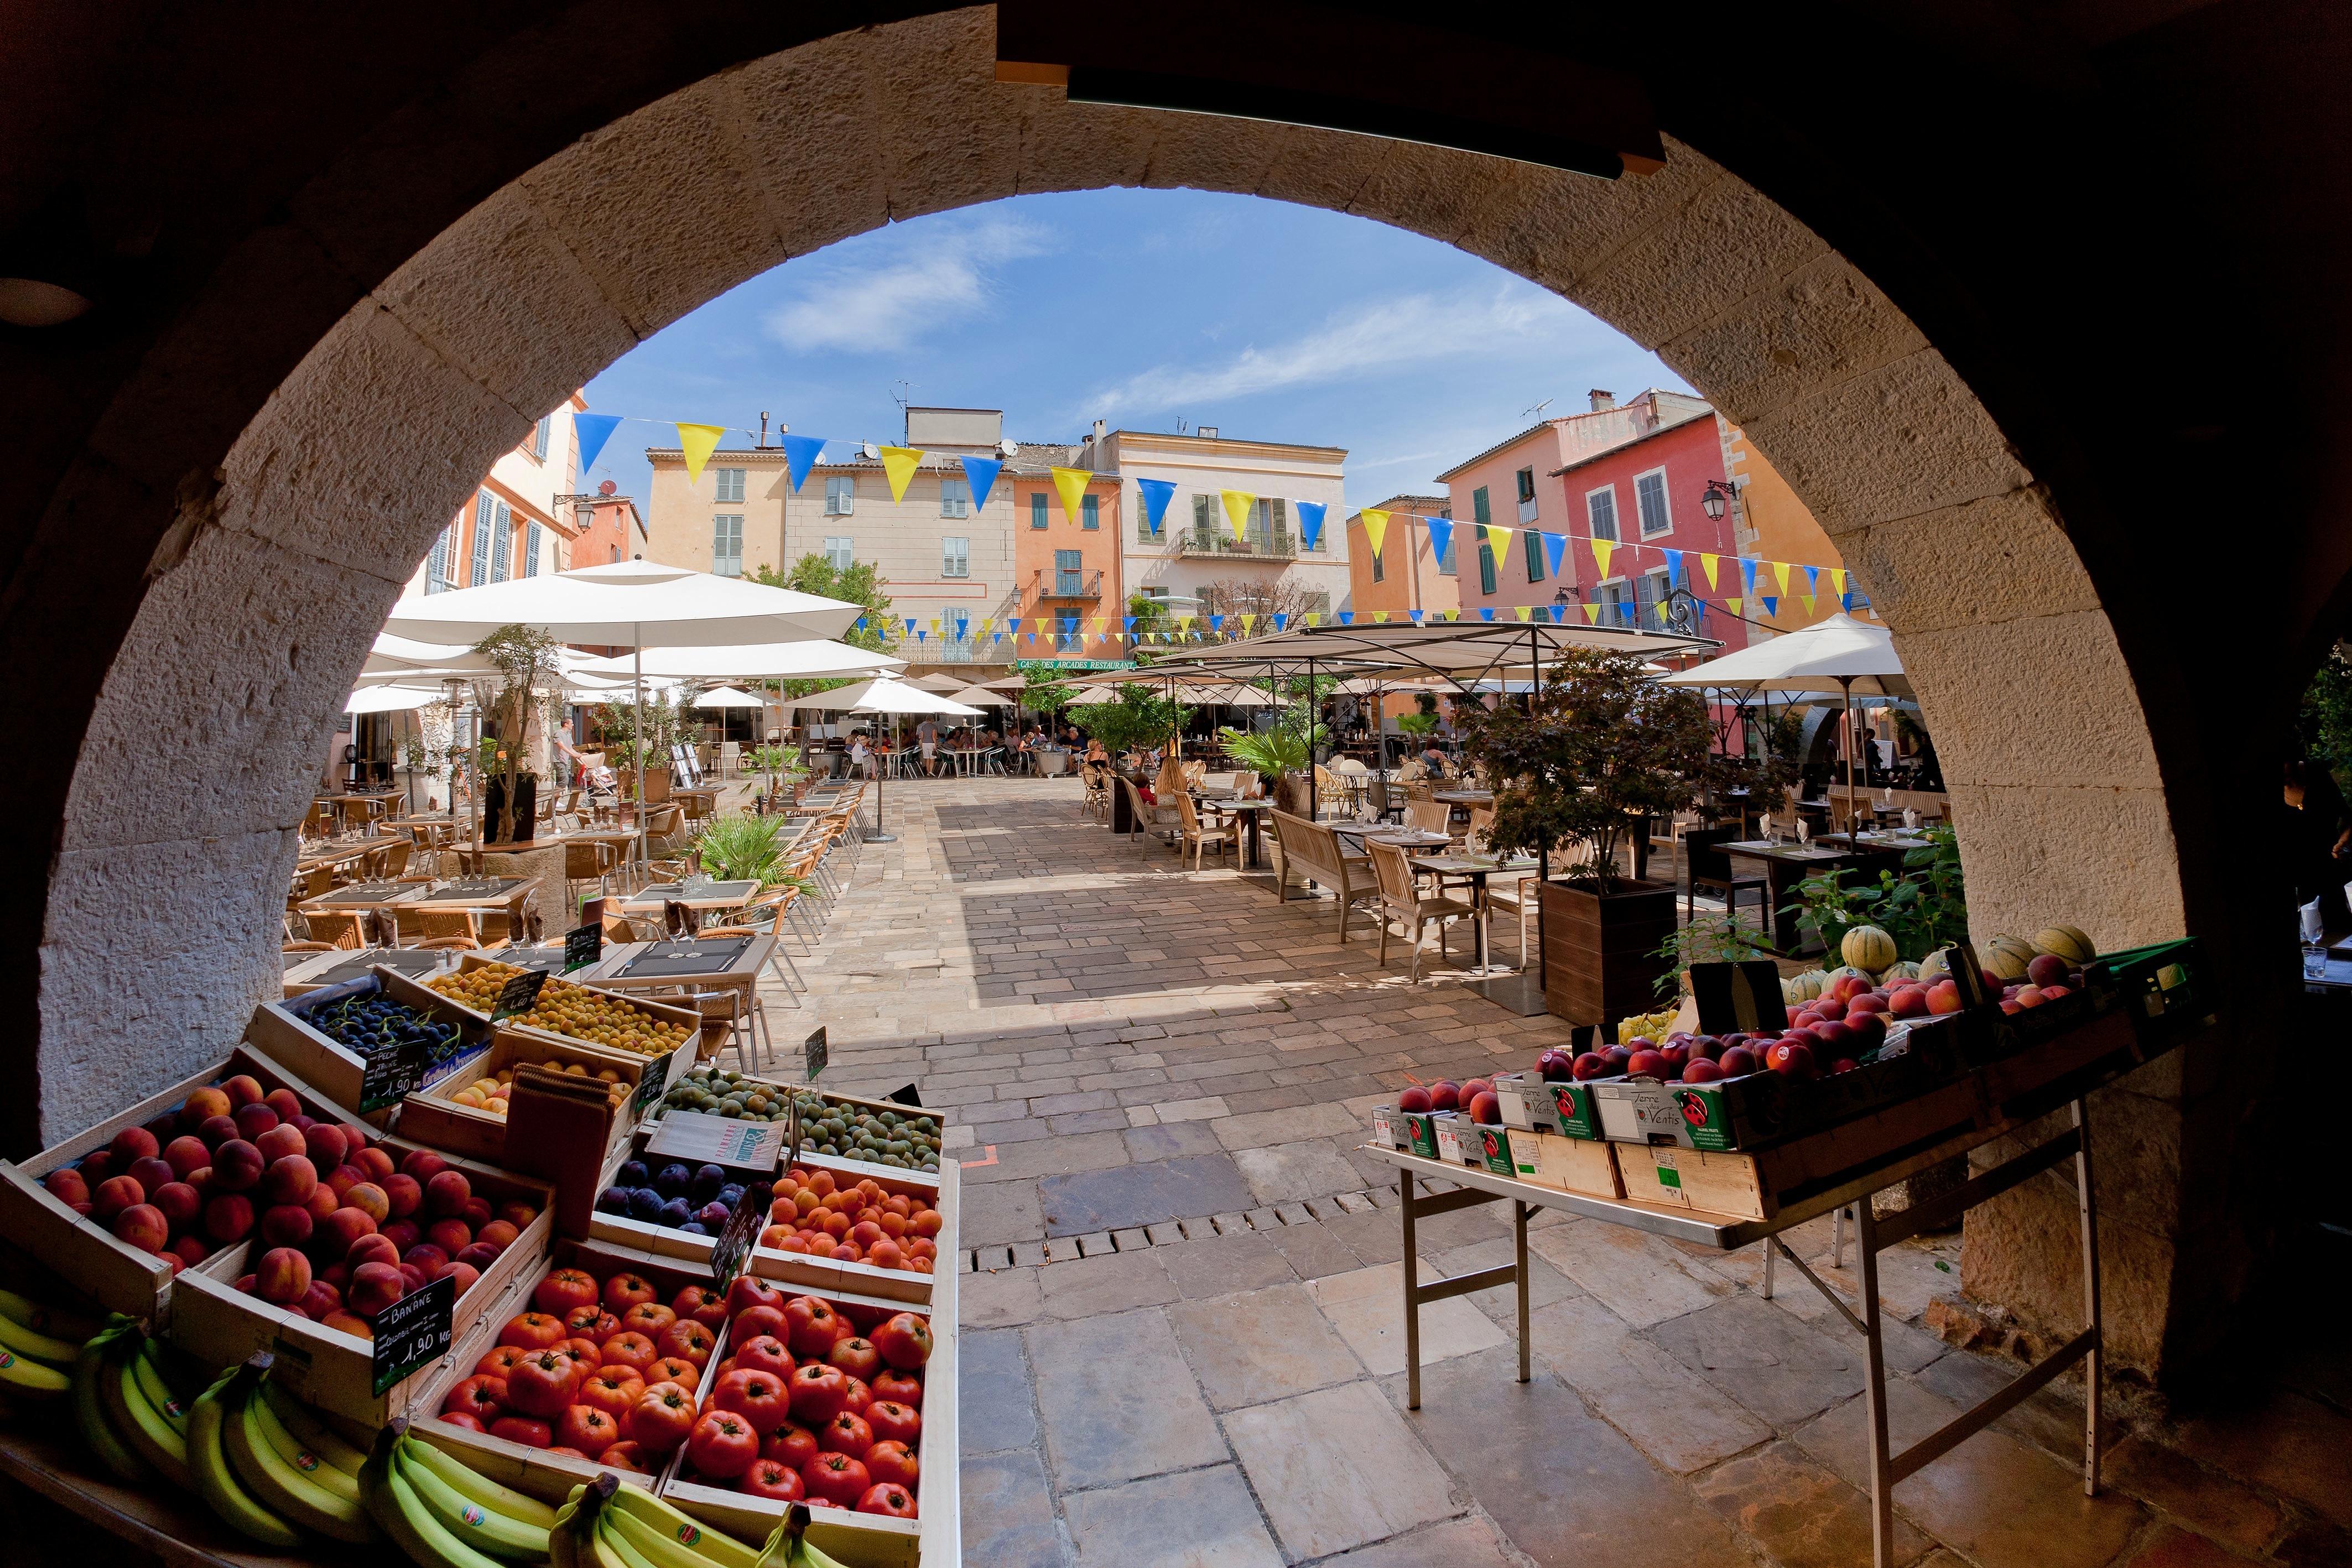 Free Images Sky Fruit Restaurant City France Arch